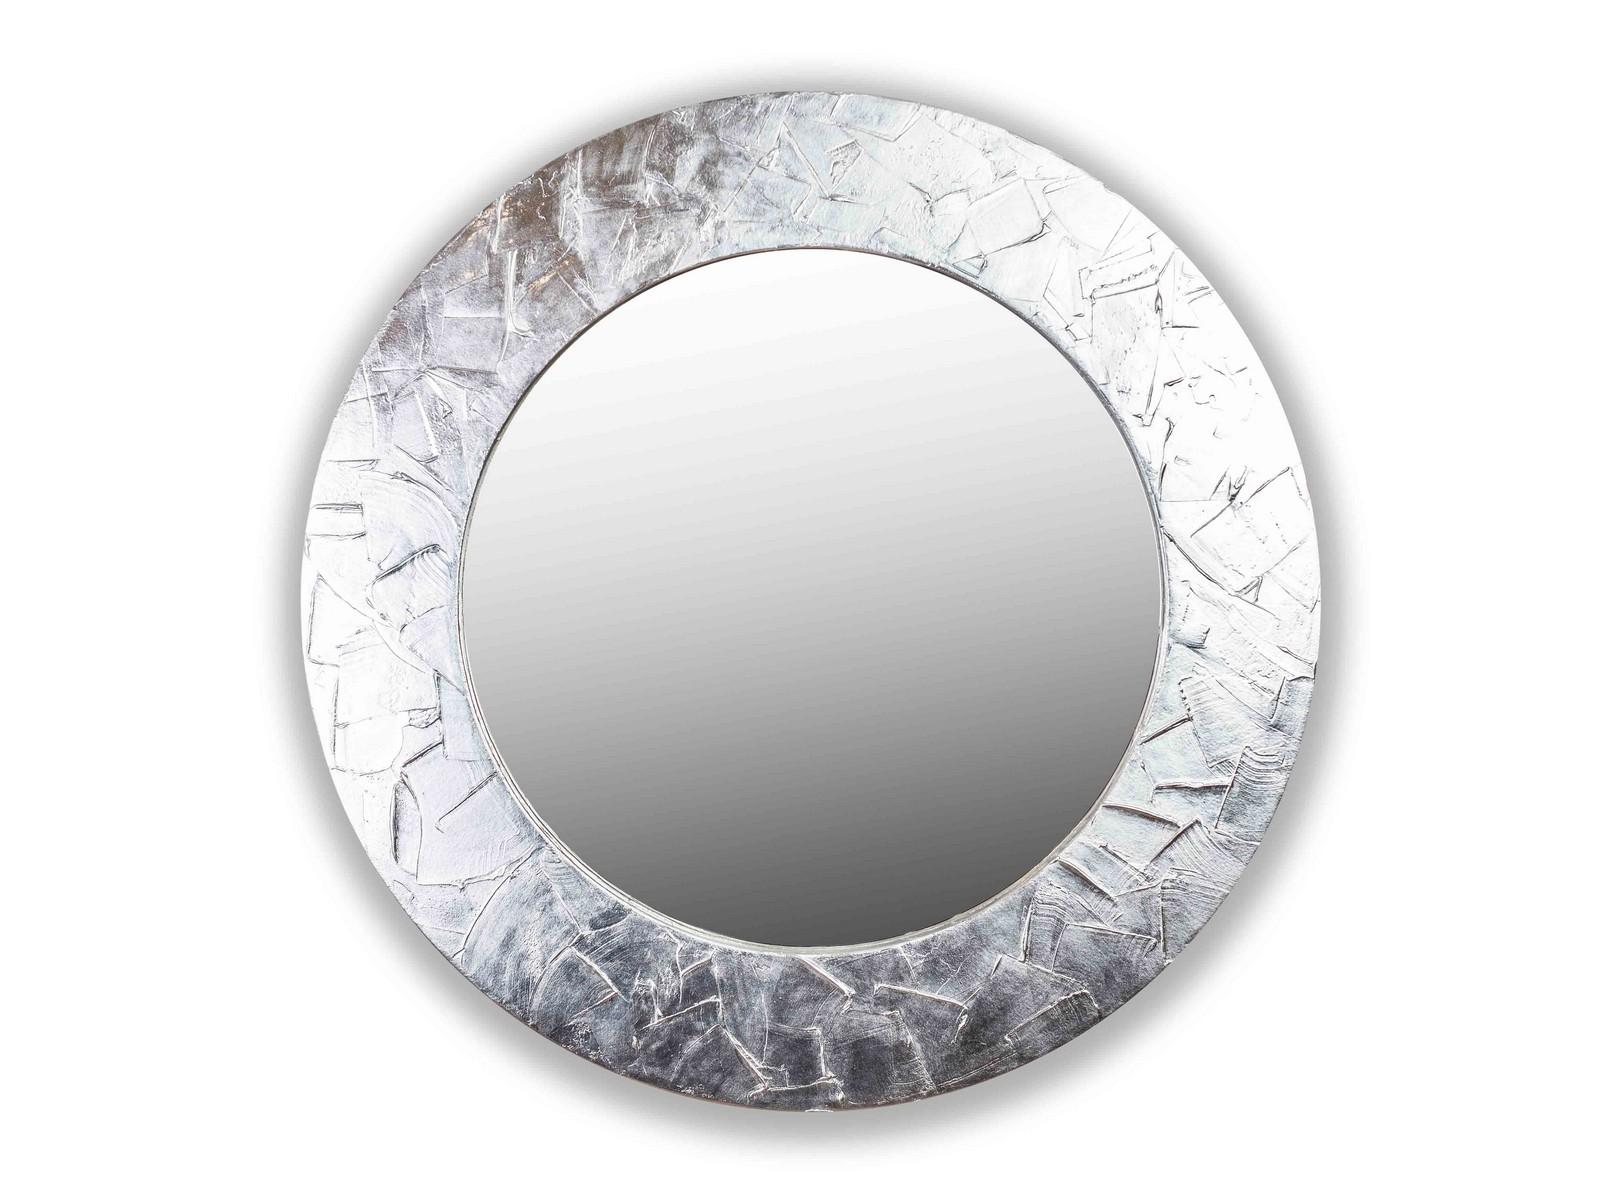 Зеркало FASHION STROKESНастенные зеркала<br>Данный вариант представлен в серебристом цвете.<br><br>Material: Дерево<br>Depth см: 4,2<br>Diameter см: 90